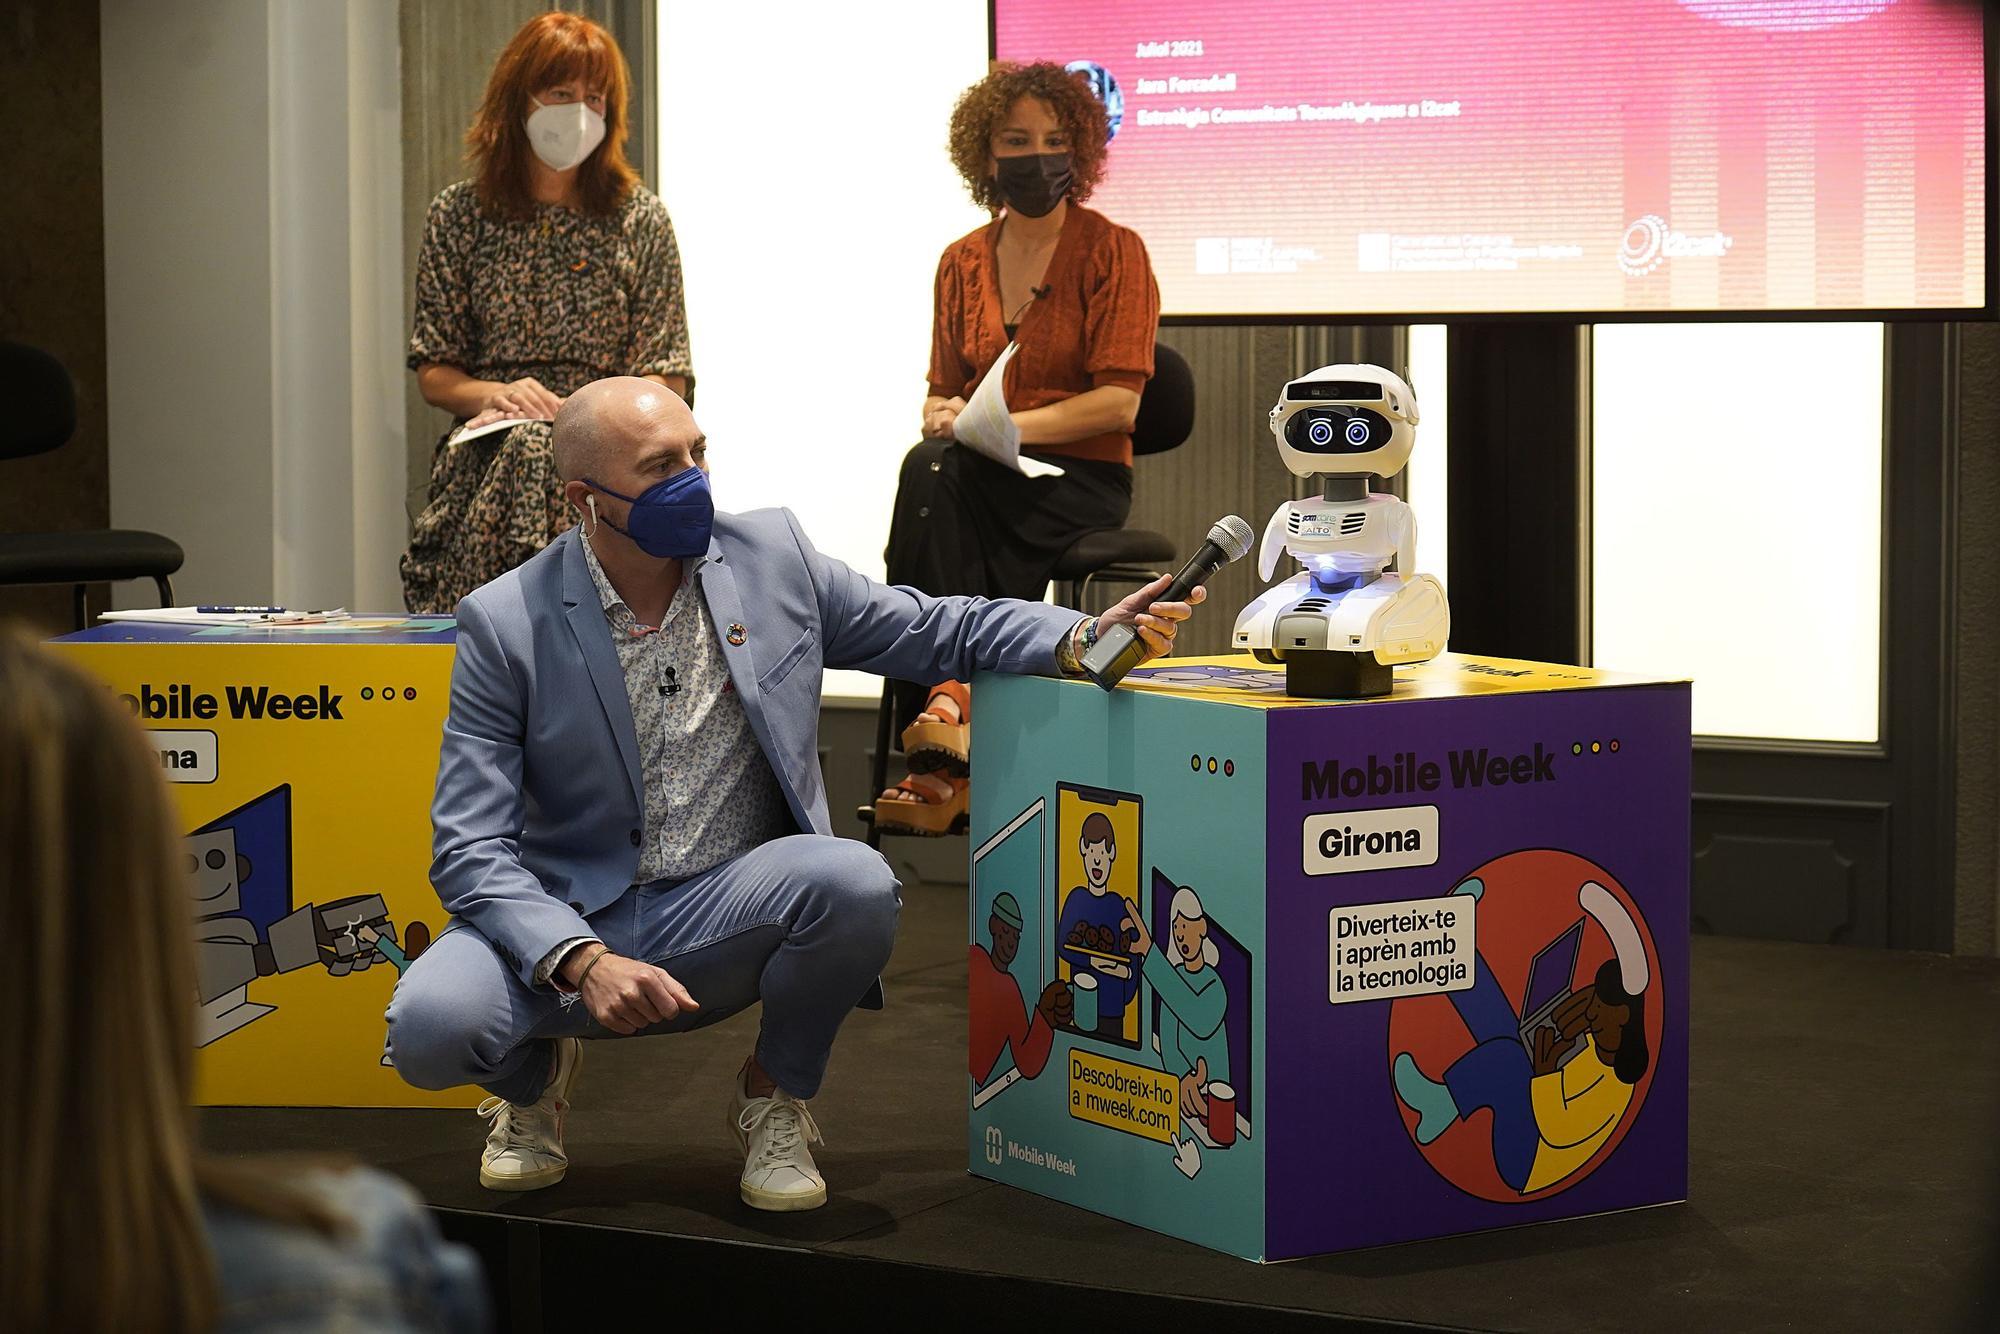 Inauguració de la Mobile Week Girona